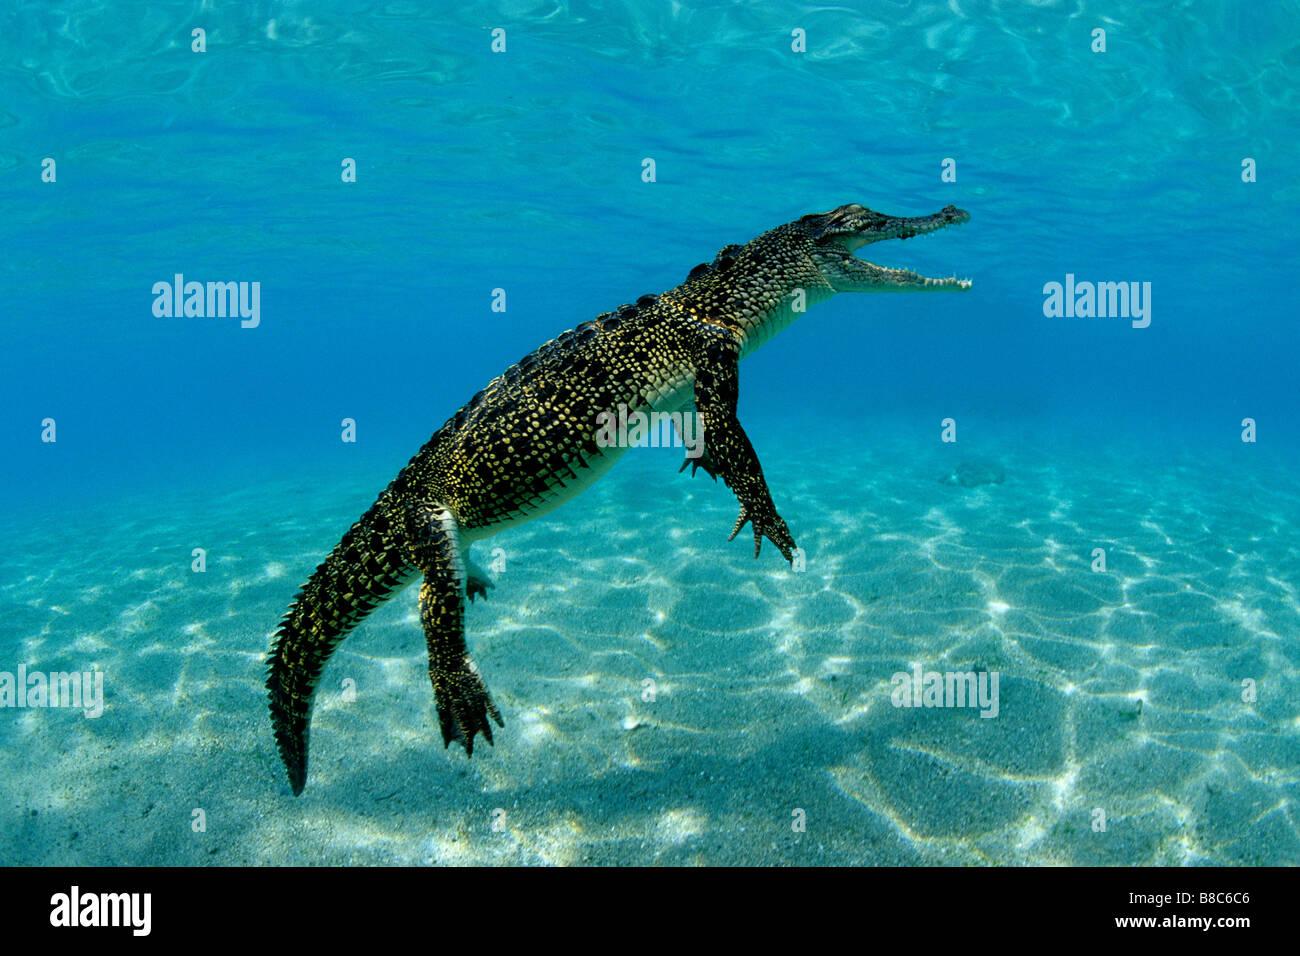 Saltwater crocodile Photo Stock